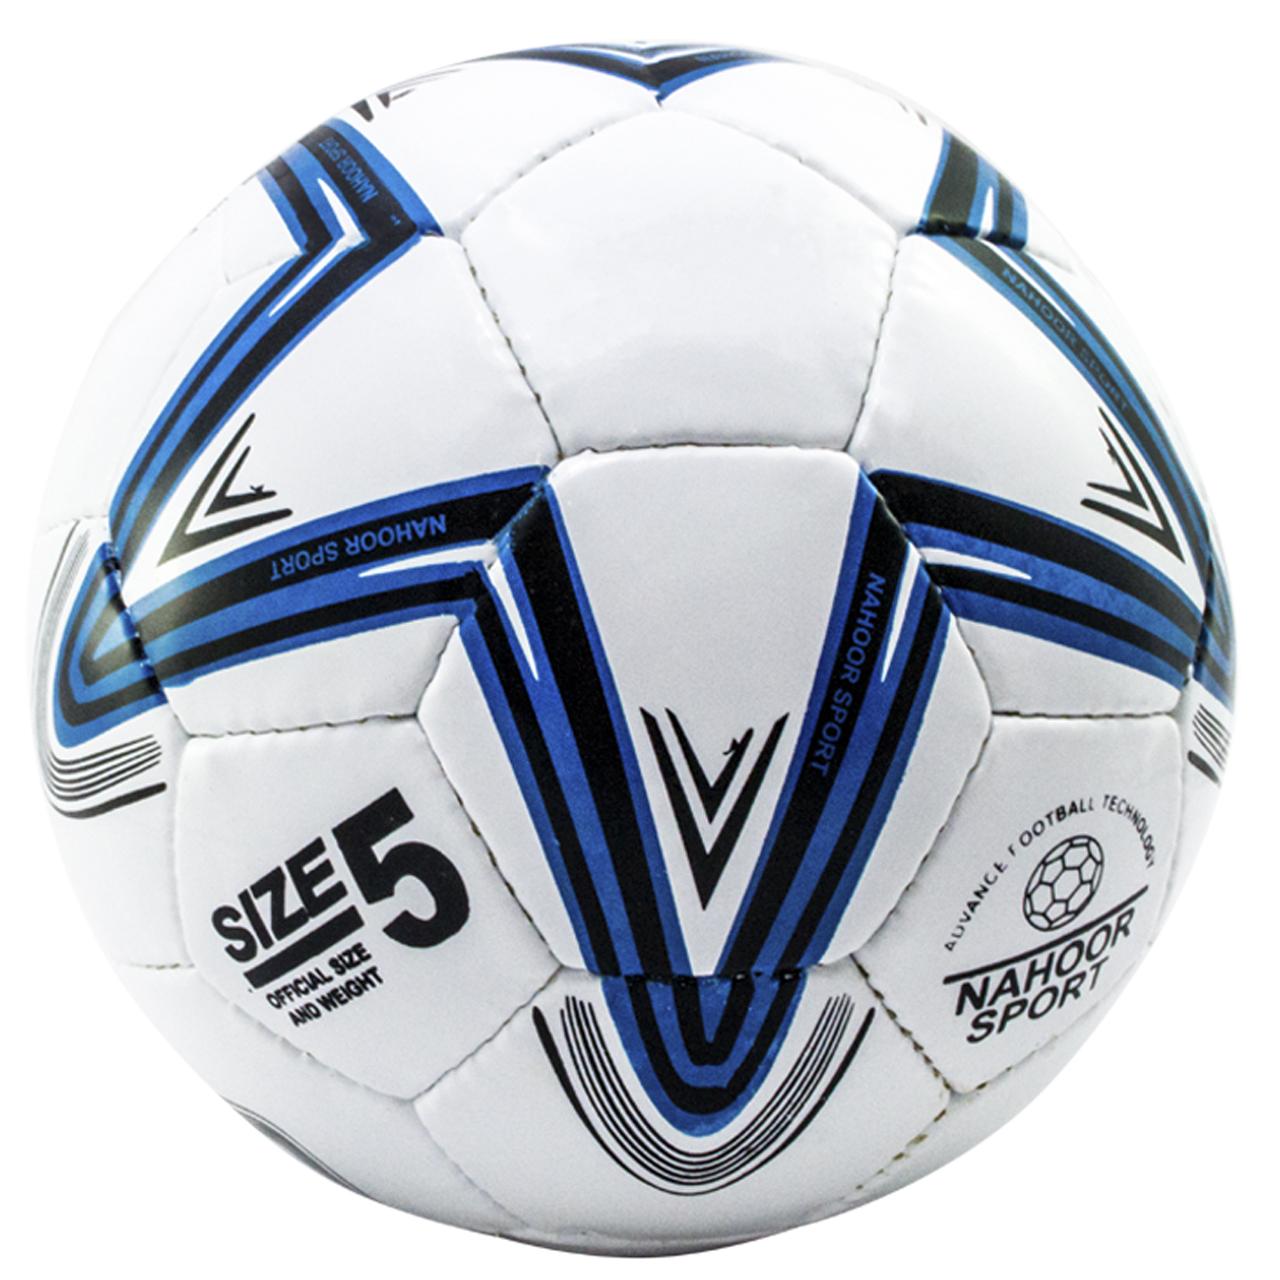 توپ فوتبال ناهور اسپرت مدل 01 وایت سایز 4